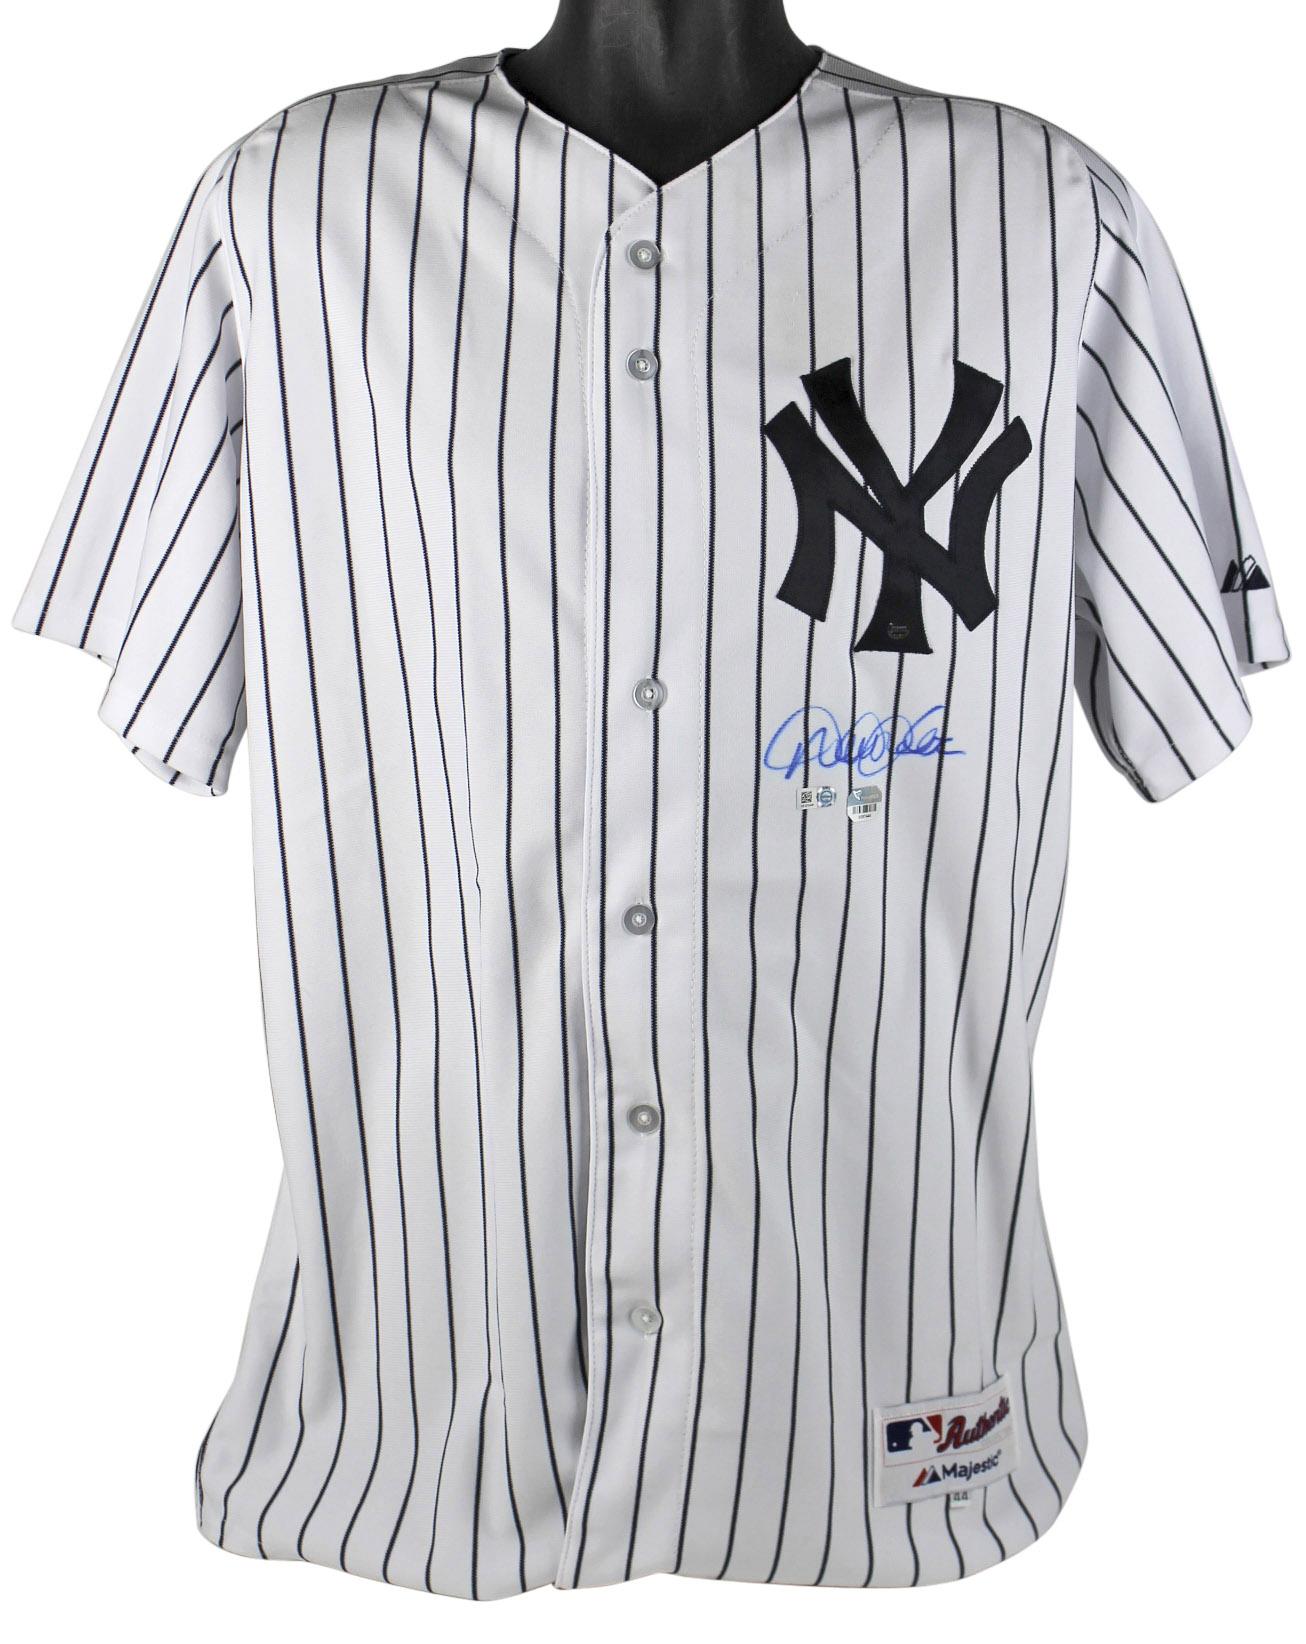 Yankees Derek Jeter Signed Pinstripe Majestic Authentic Jersey MLB & Fanatics